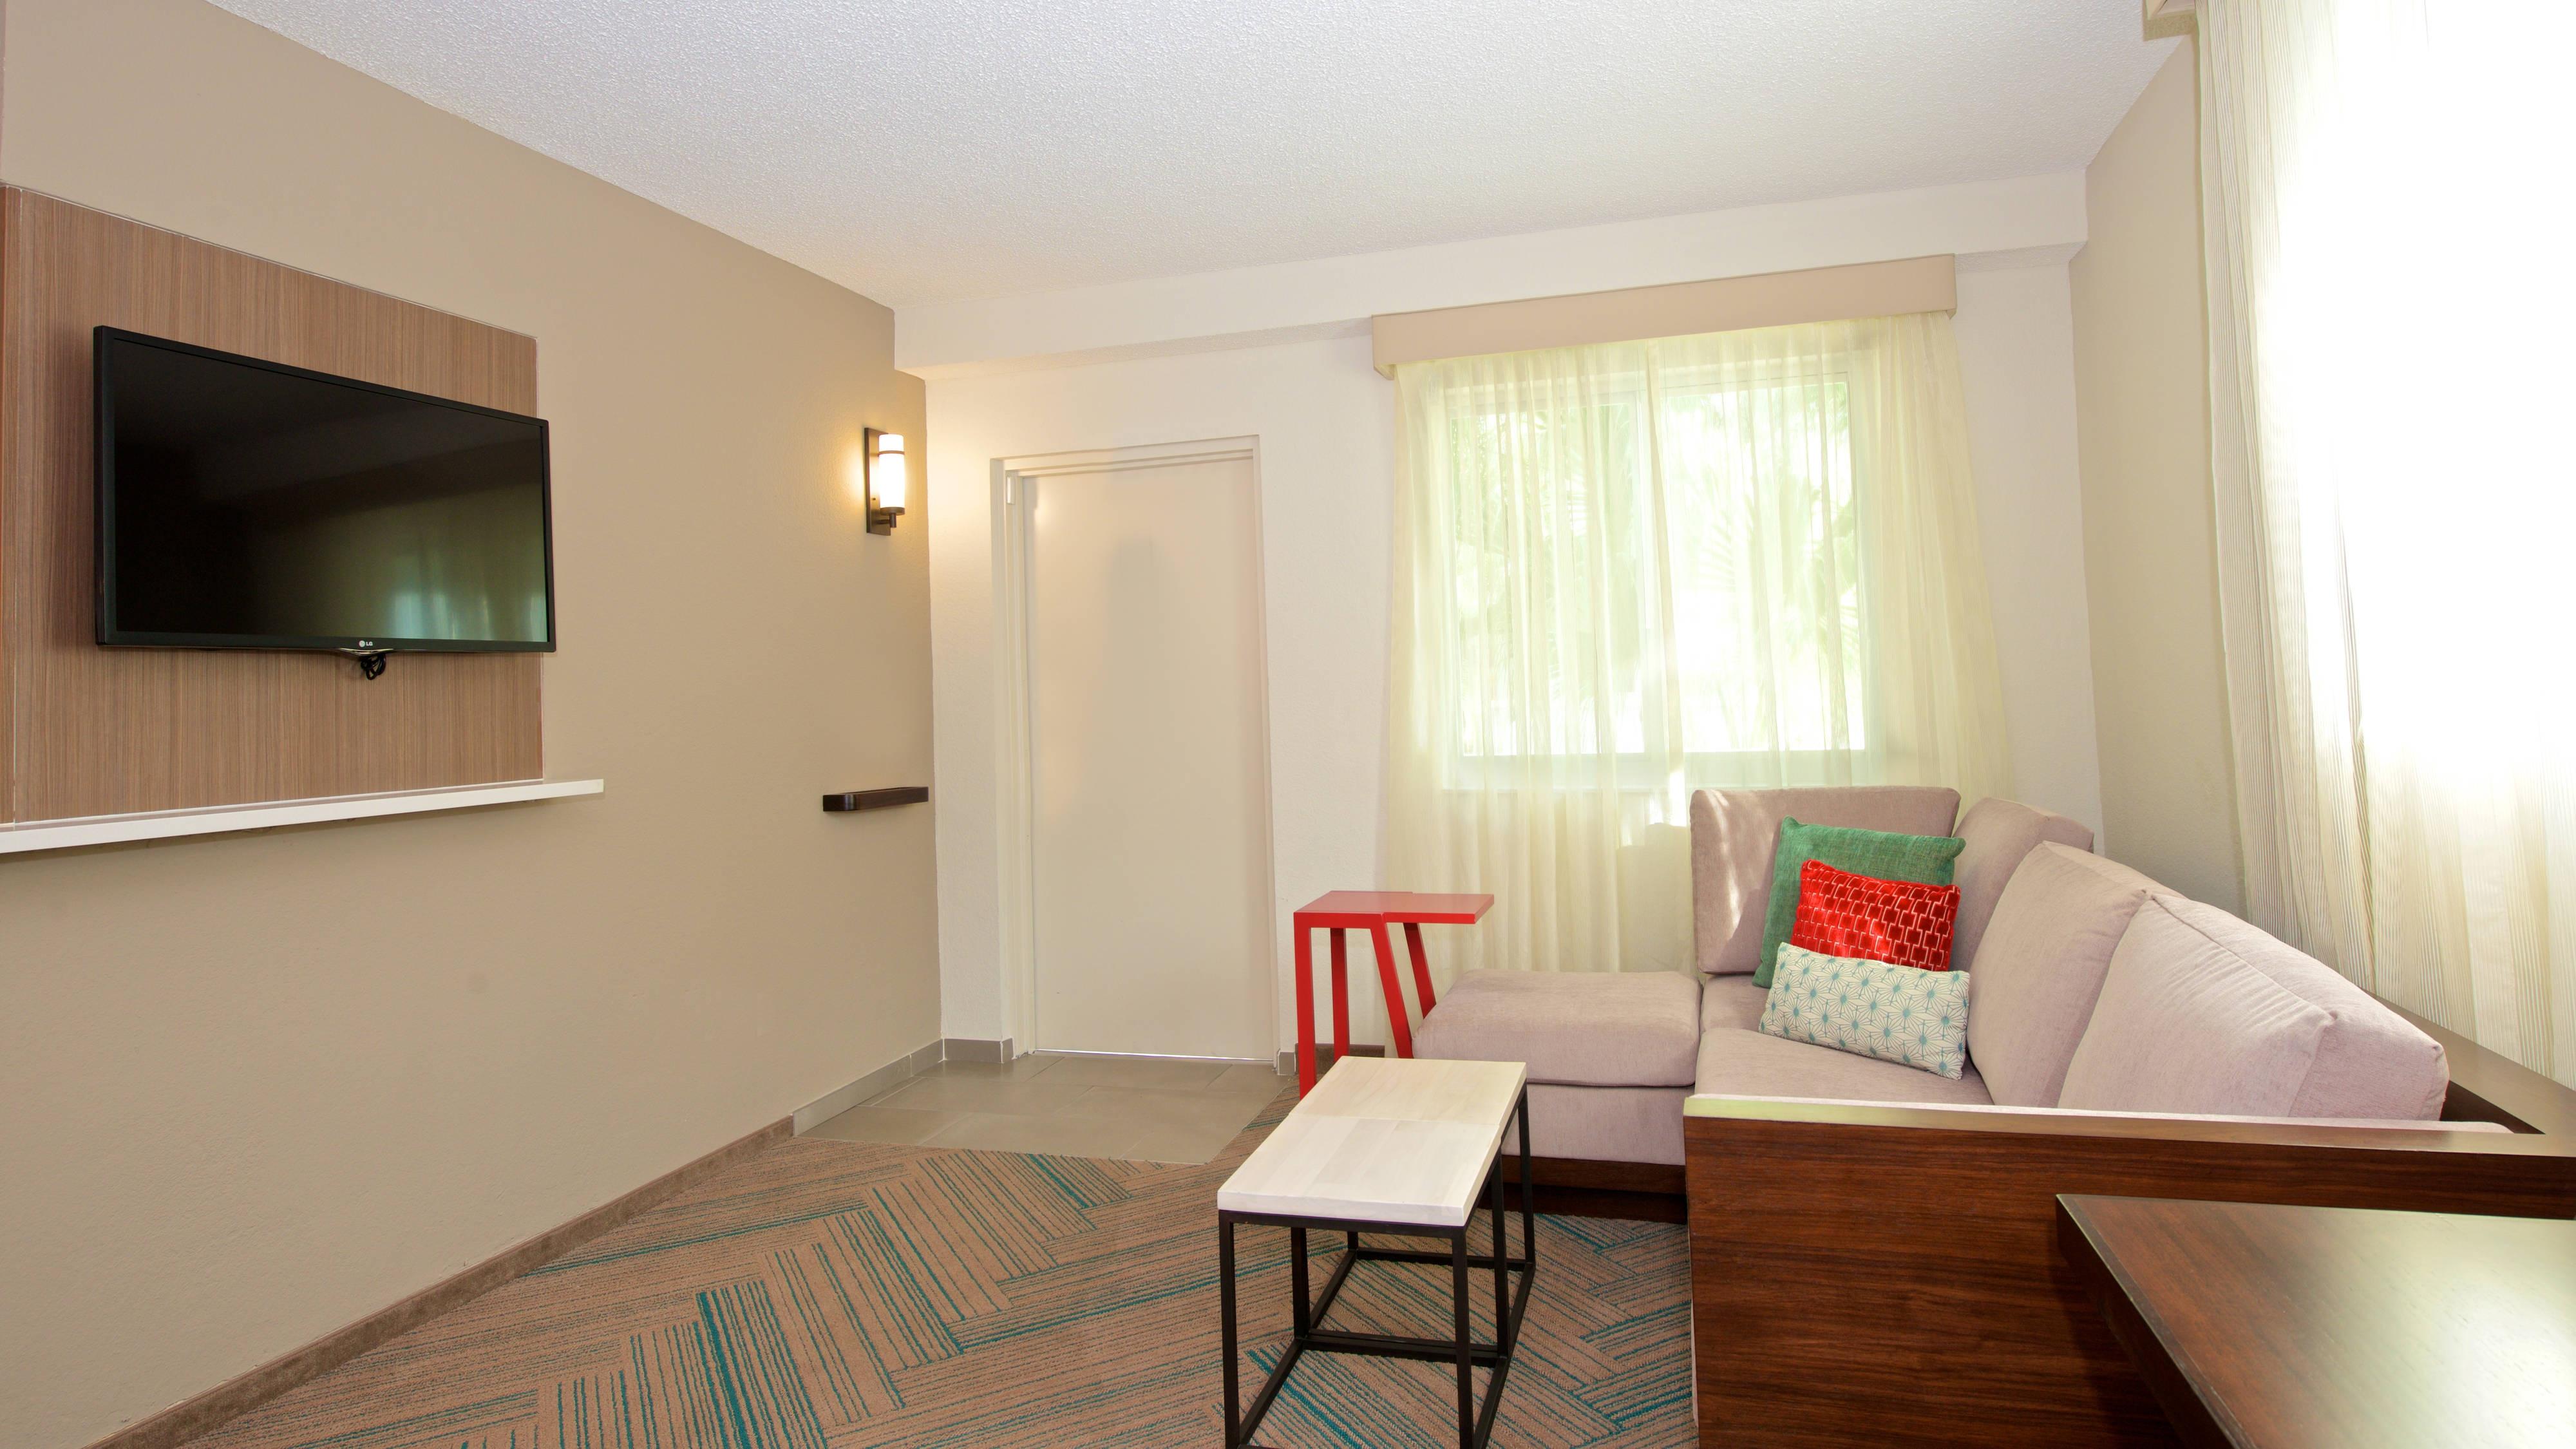 Miami Hotel One Bedroom Suite